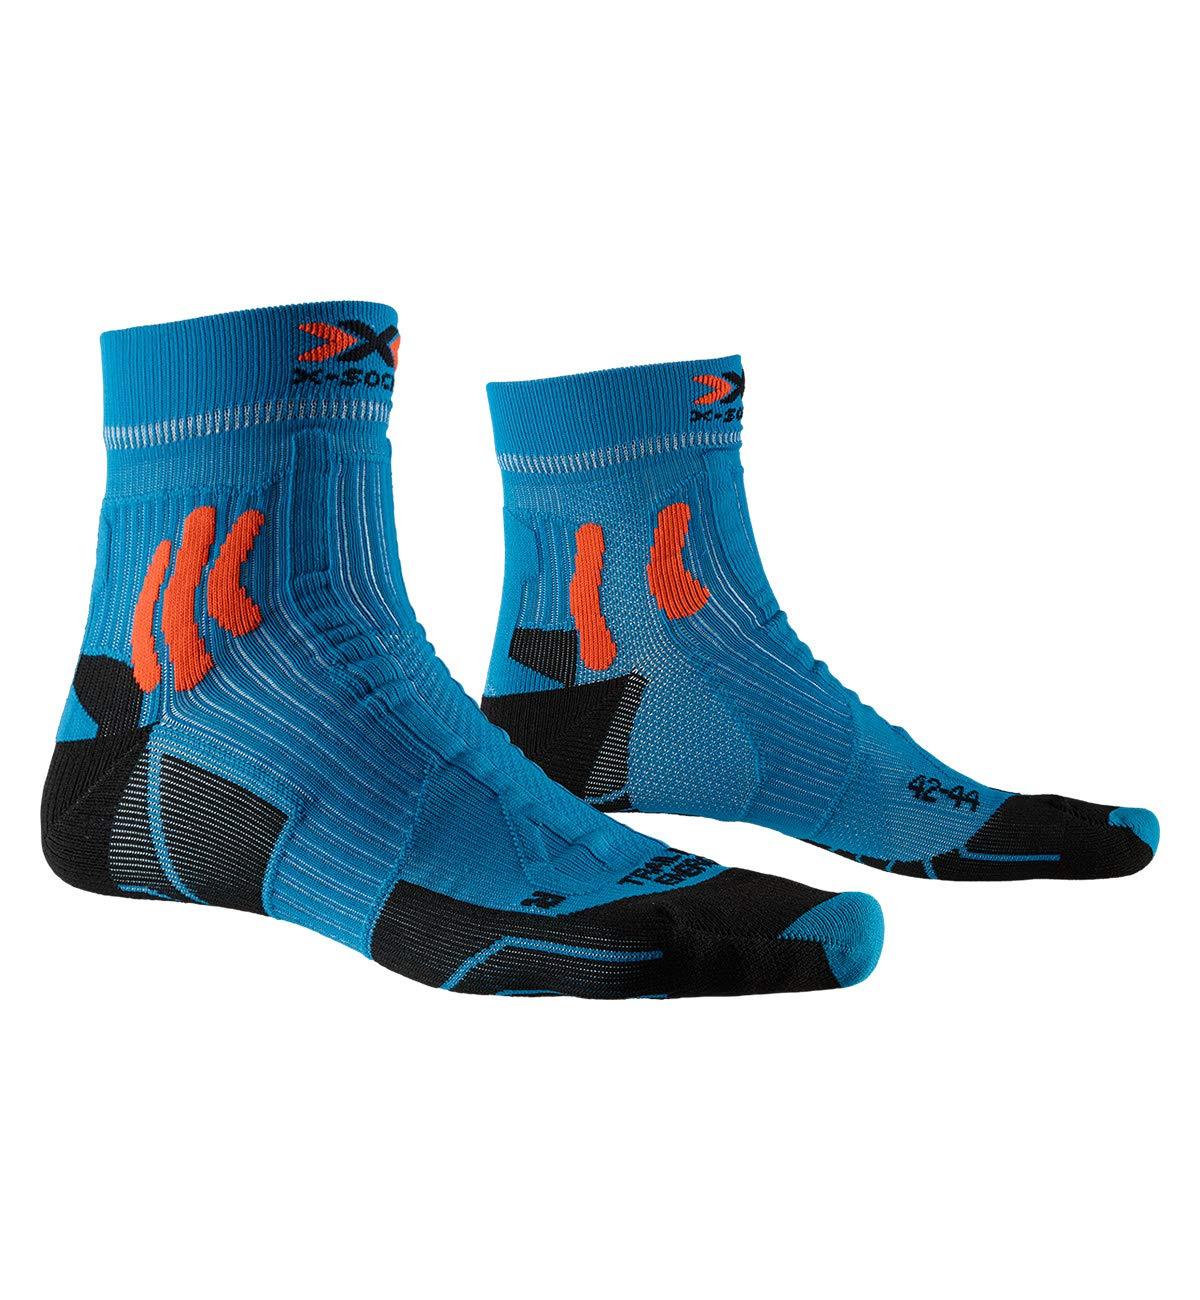 X-Socks Socks Trail Run Energy, Teal Blue/Sunset Orange, 35-38, XS-RS13S19U-A008